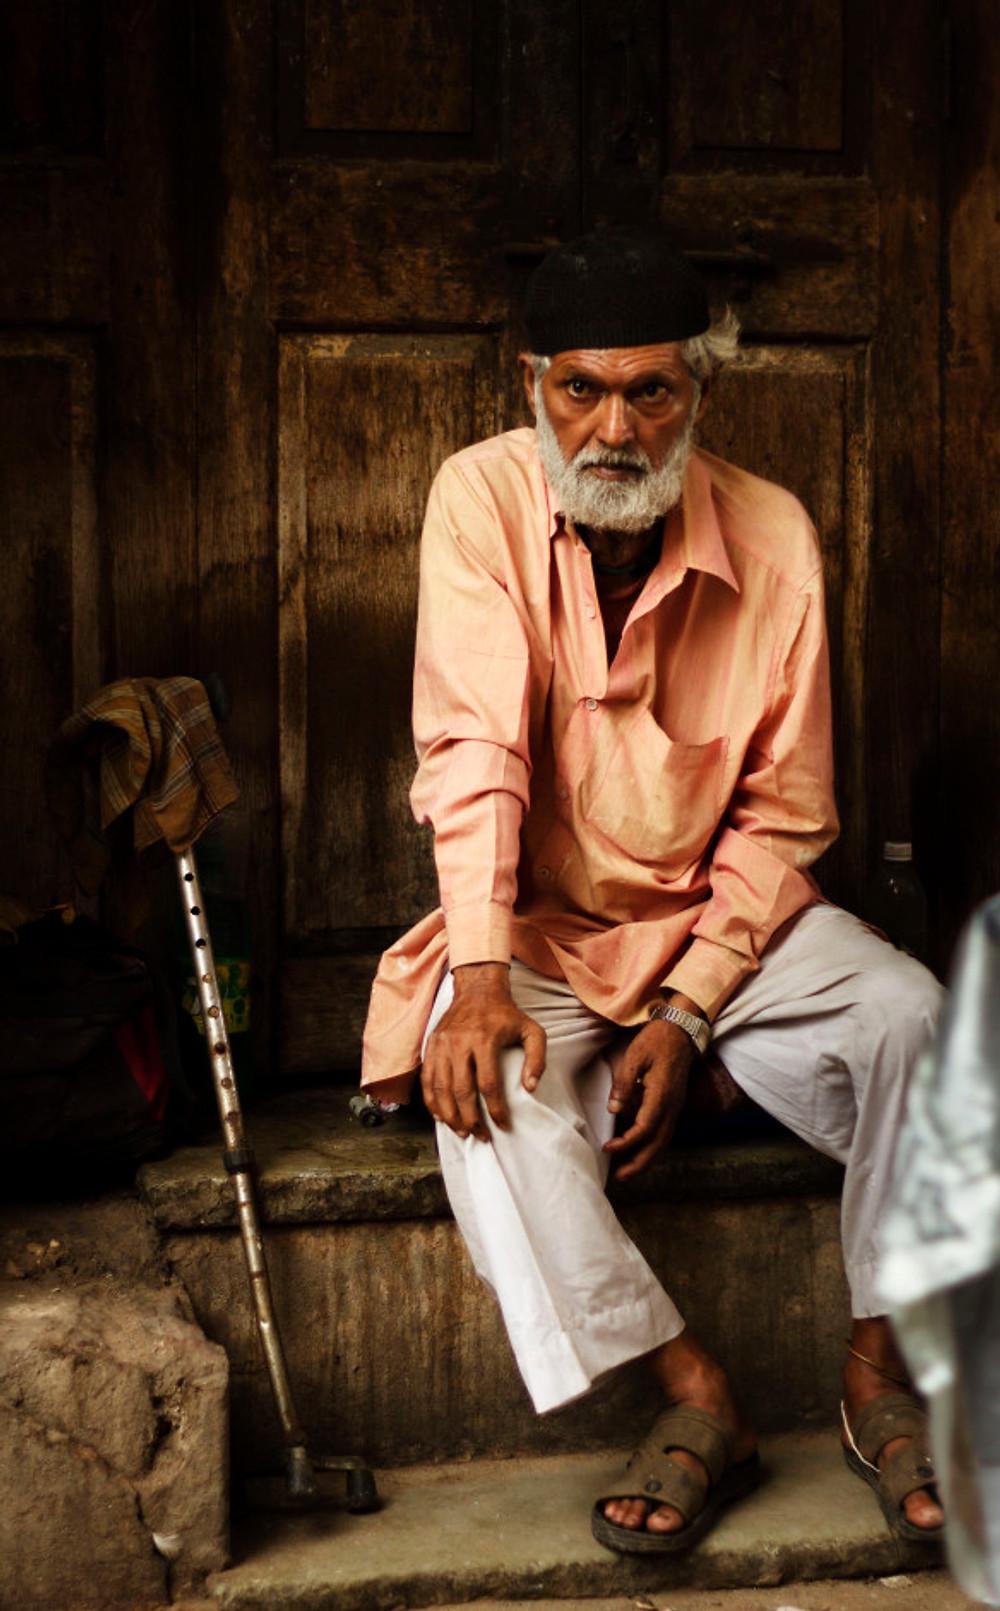 Perplexed-rohit-pansare-photos-ahmedabad-old-city